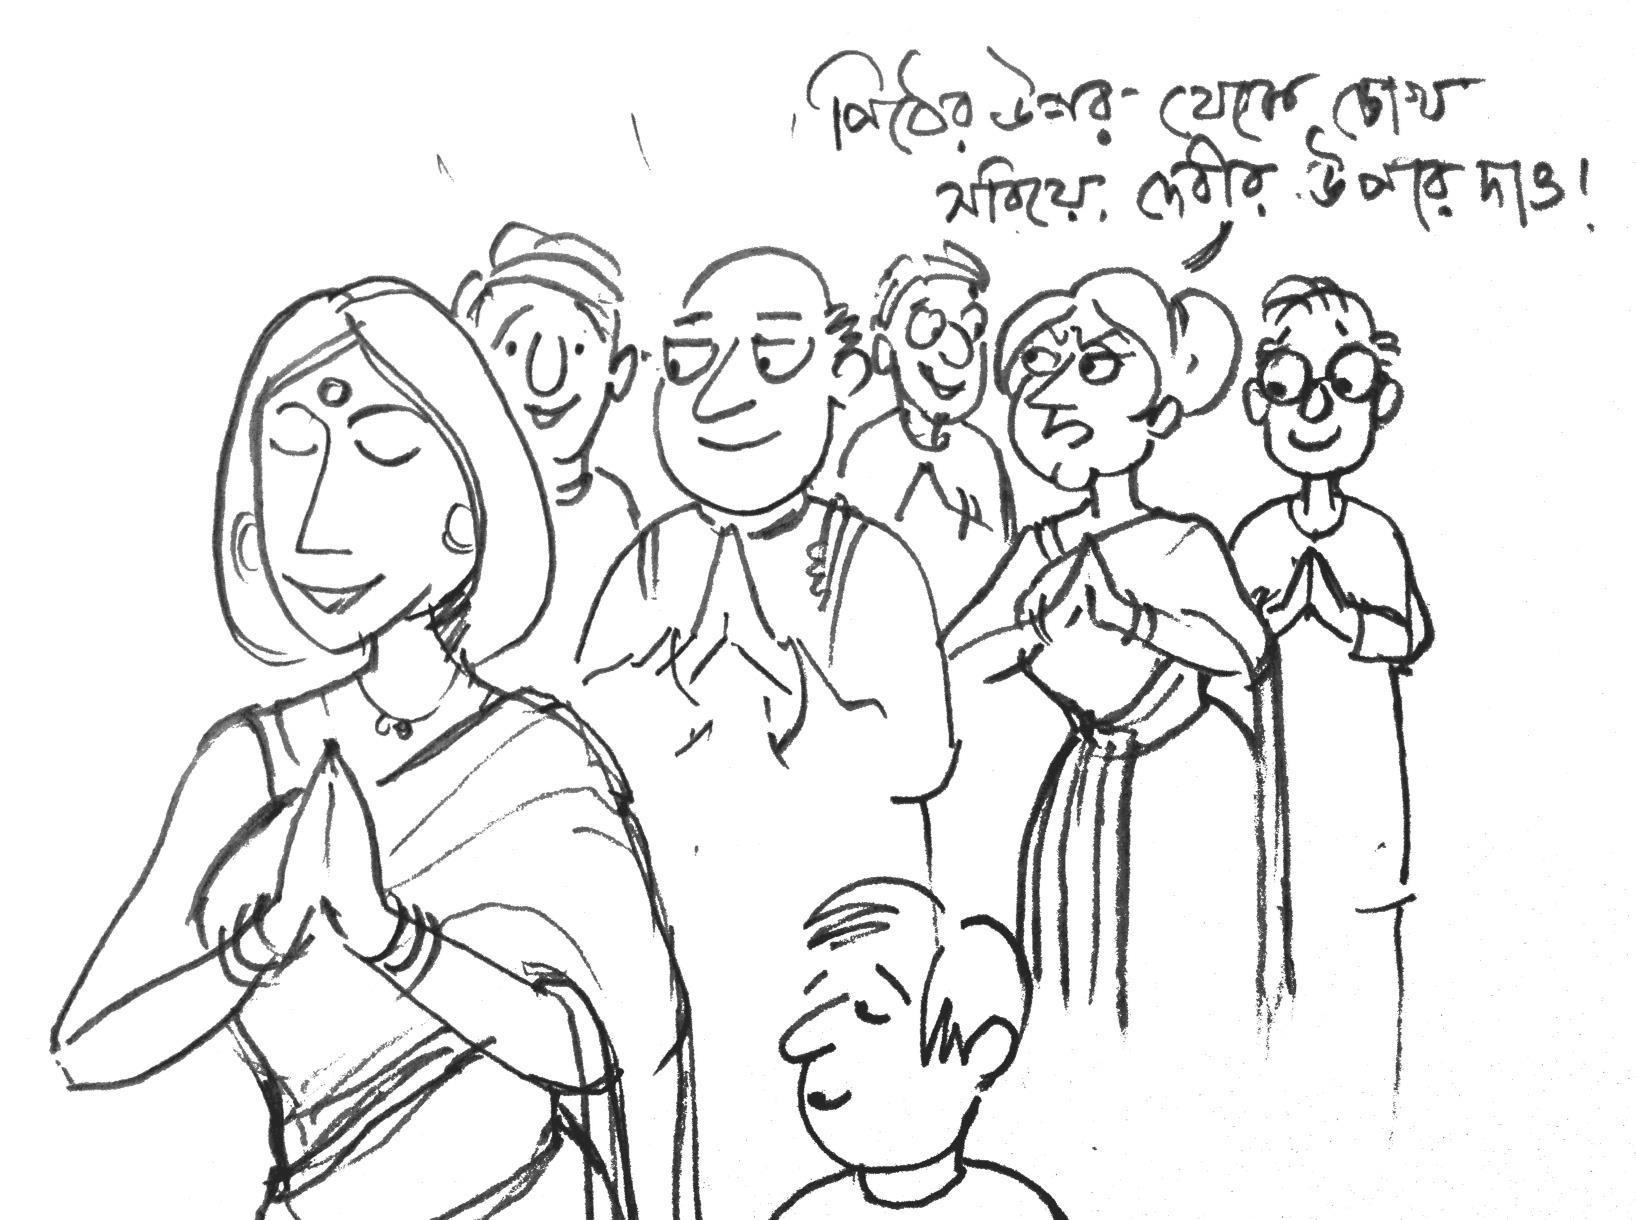 1636x1220 New Jersey Durga Puja 2013 Nynj Bengali